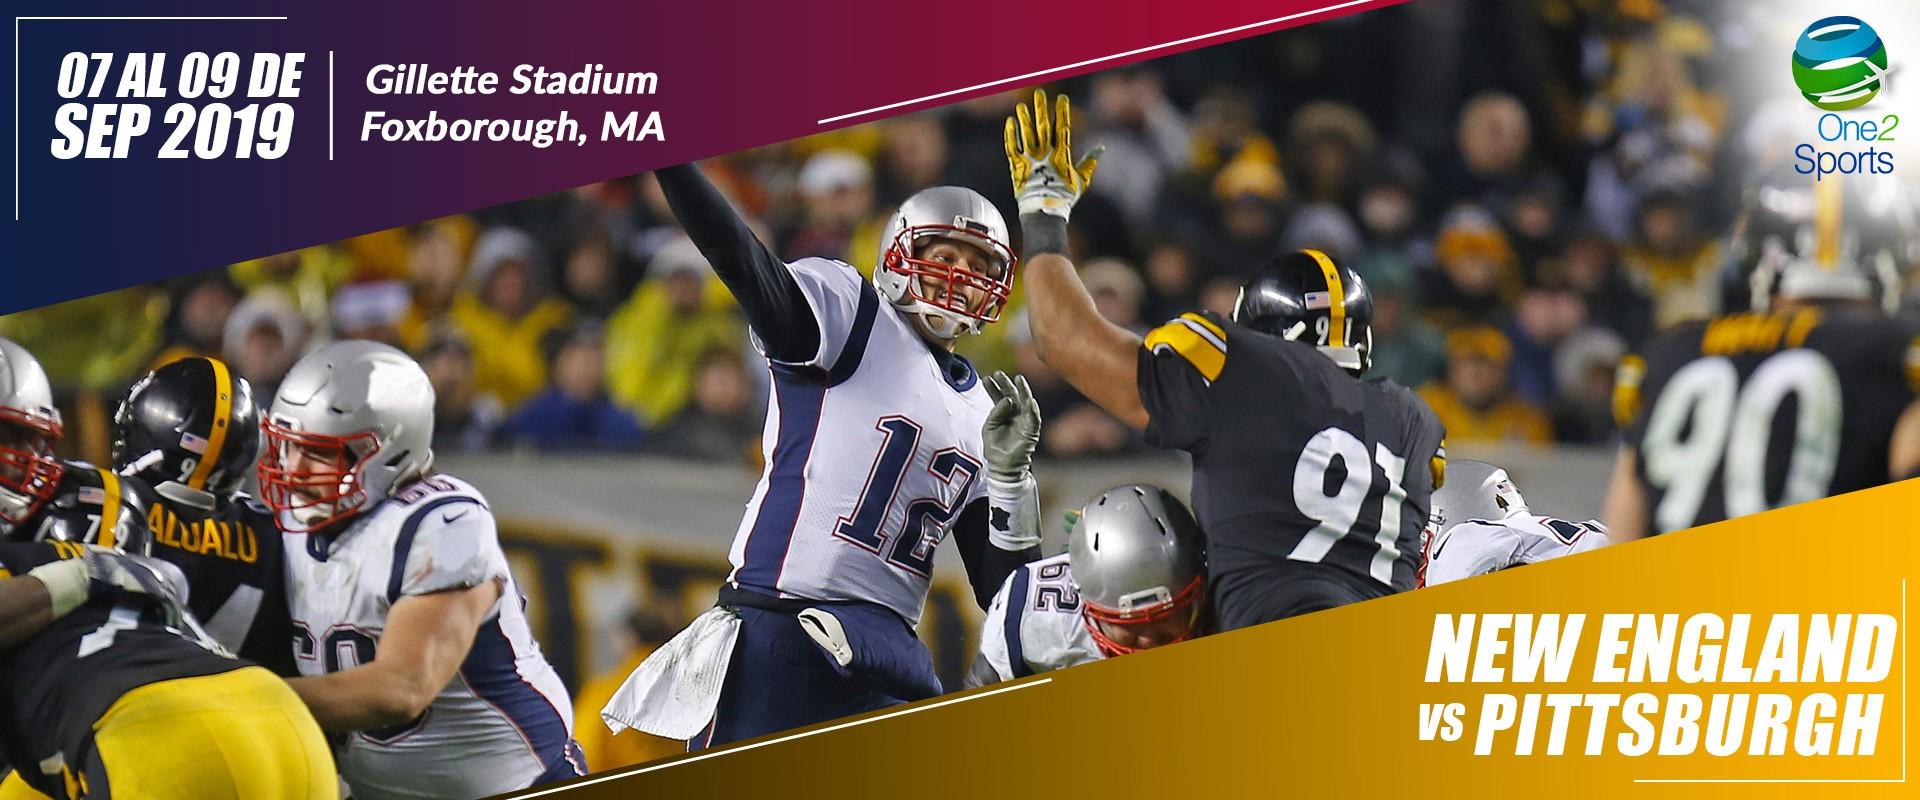 New England vs Pittsburgh